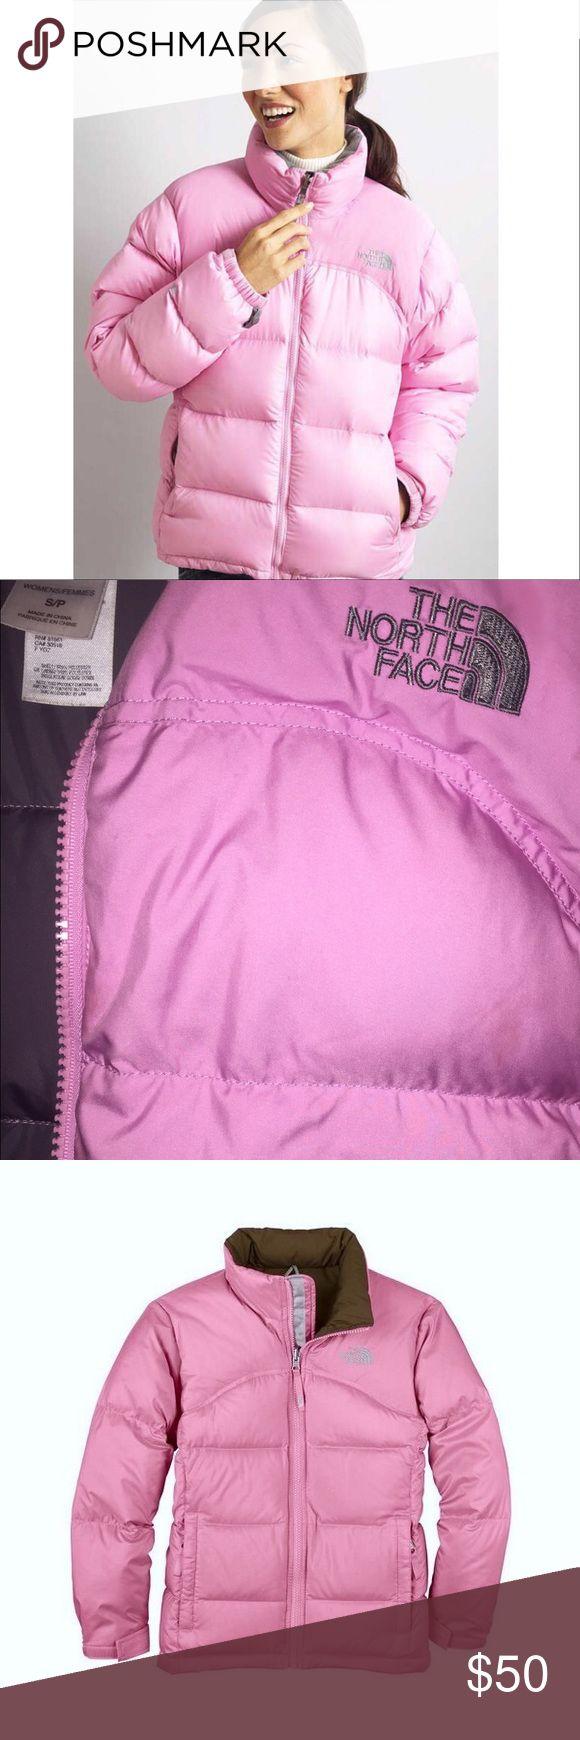 North Face Nuptse Jacket size Small North Face Goose down filled jacket size small. Two Smalls available! North Face Jackets & Coats Puffers